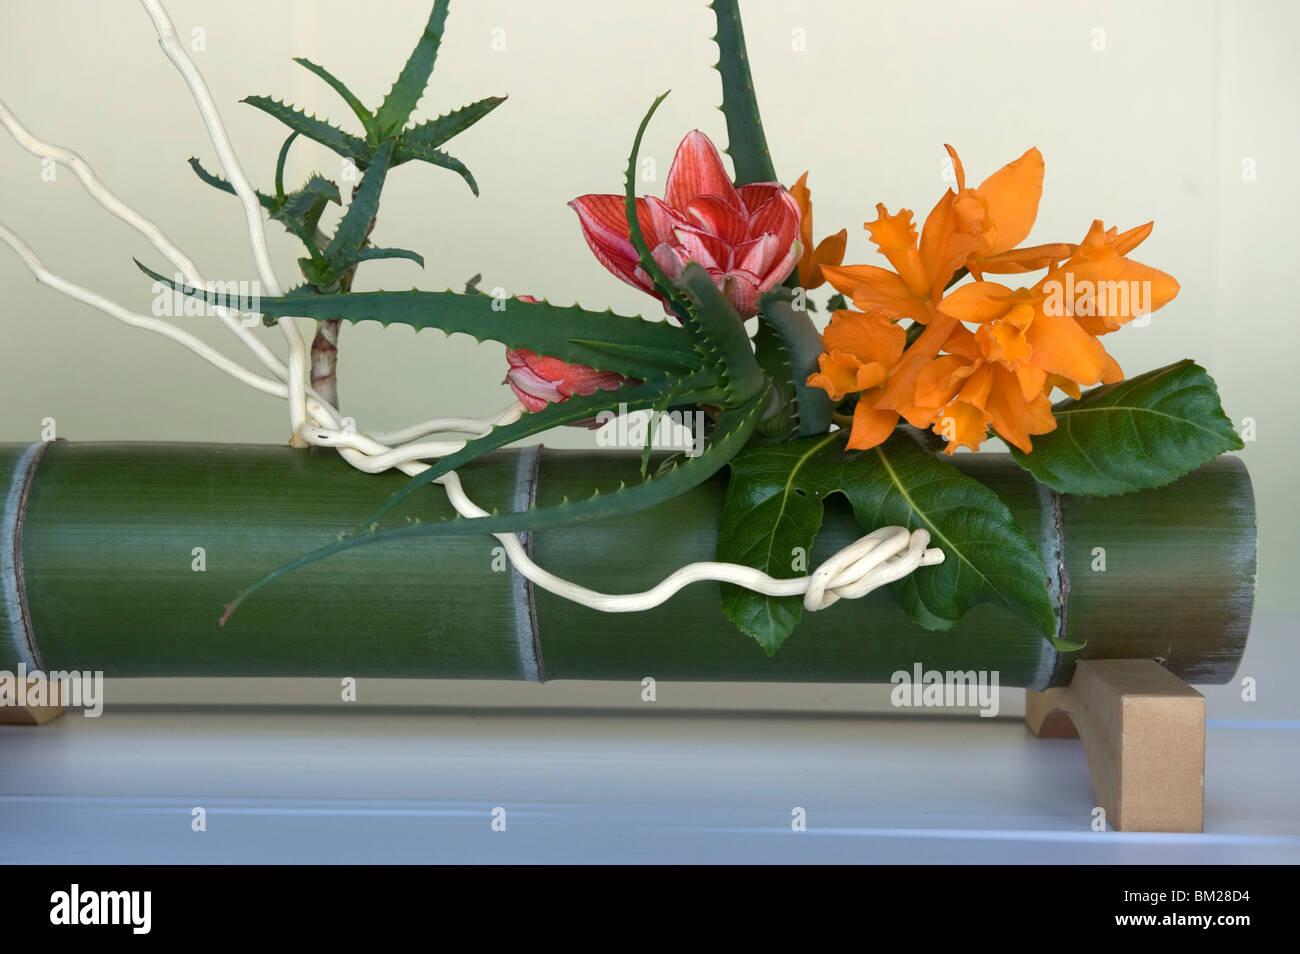 Japanese flower arranging ikebana also called the way of flowers japanese flower arranging ikebana also called the way of flowers kado japan sciox Gallery